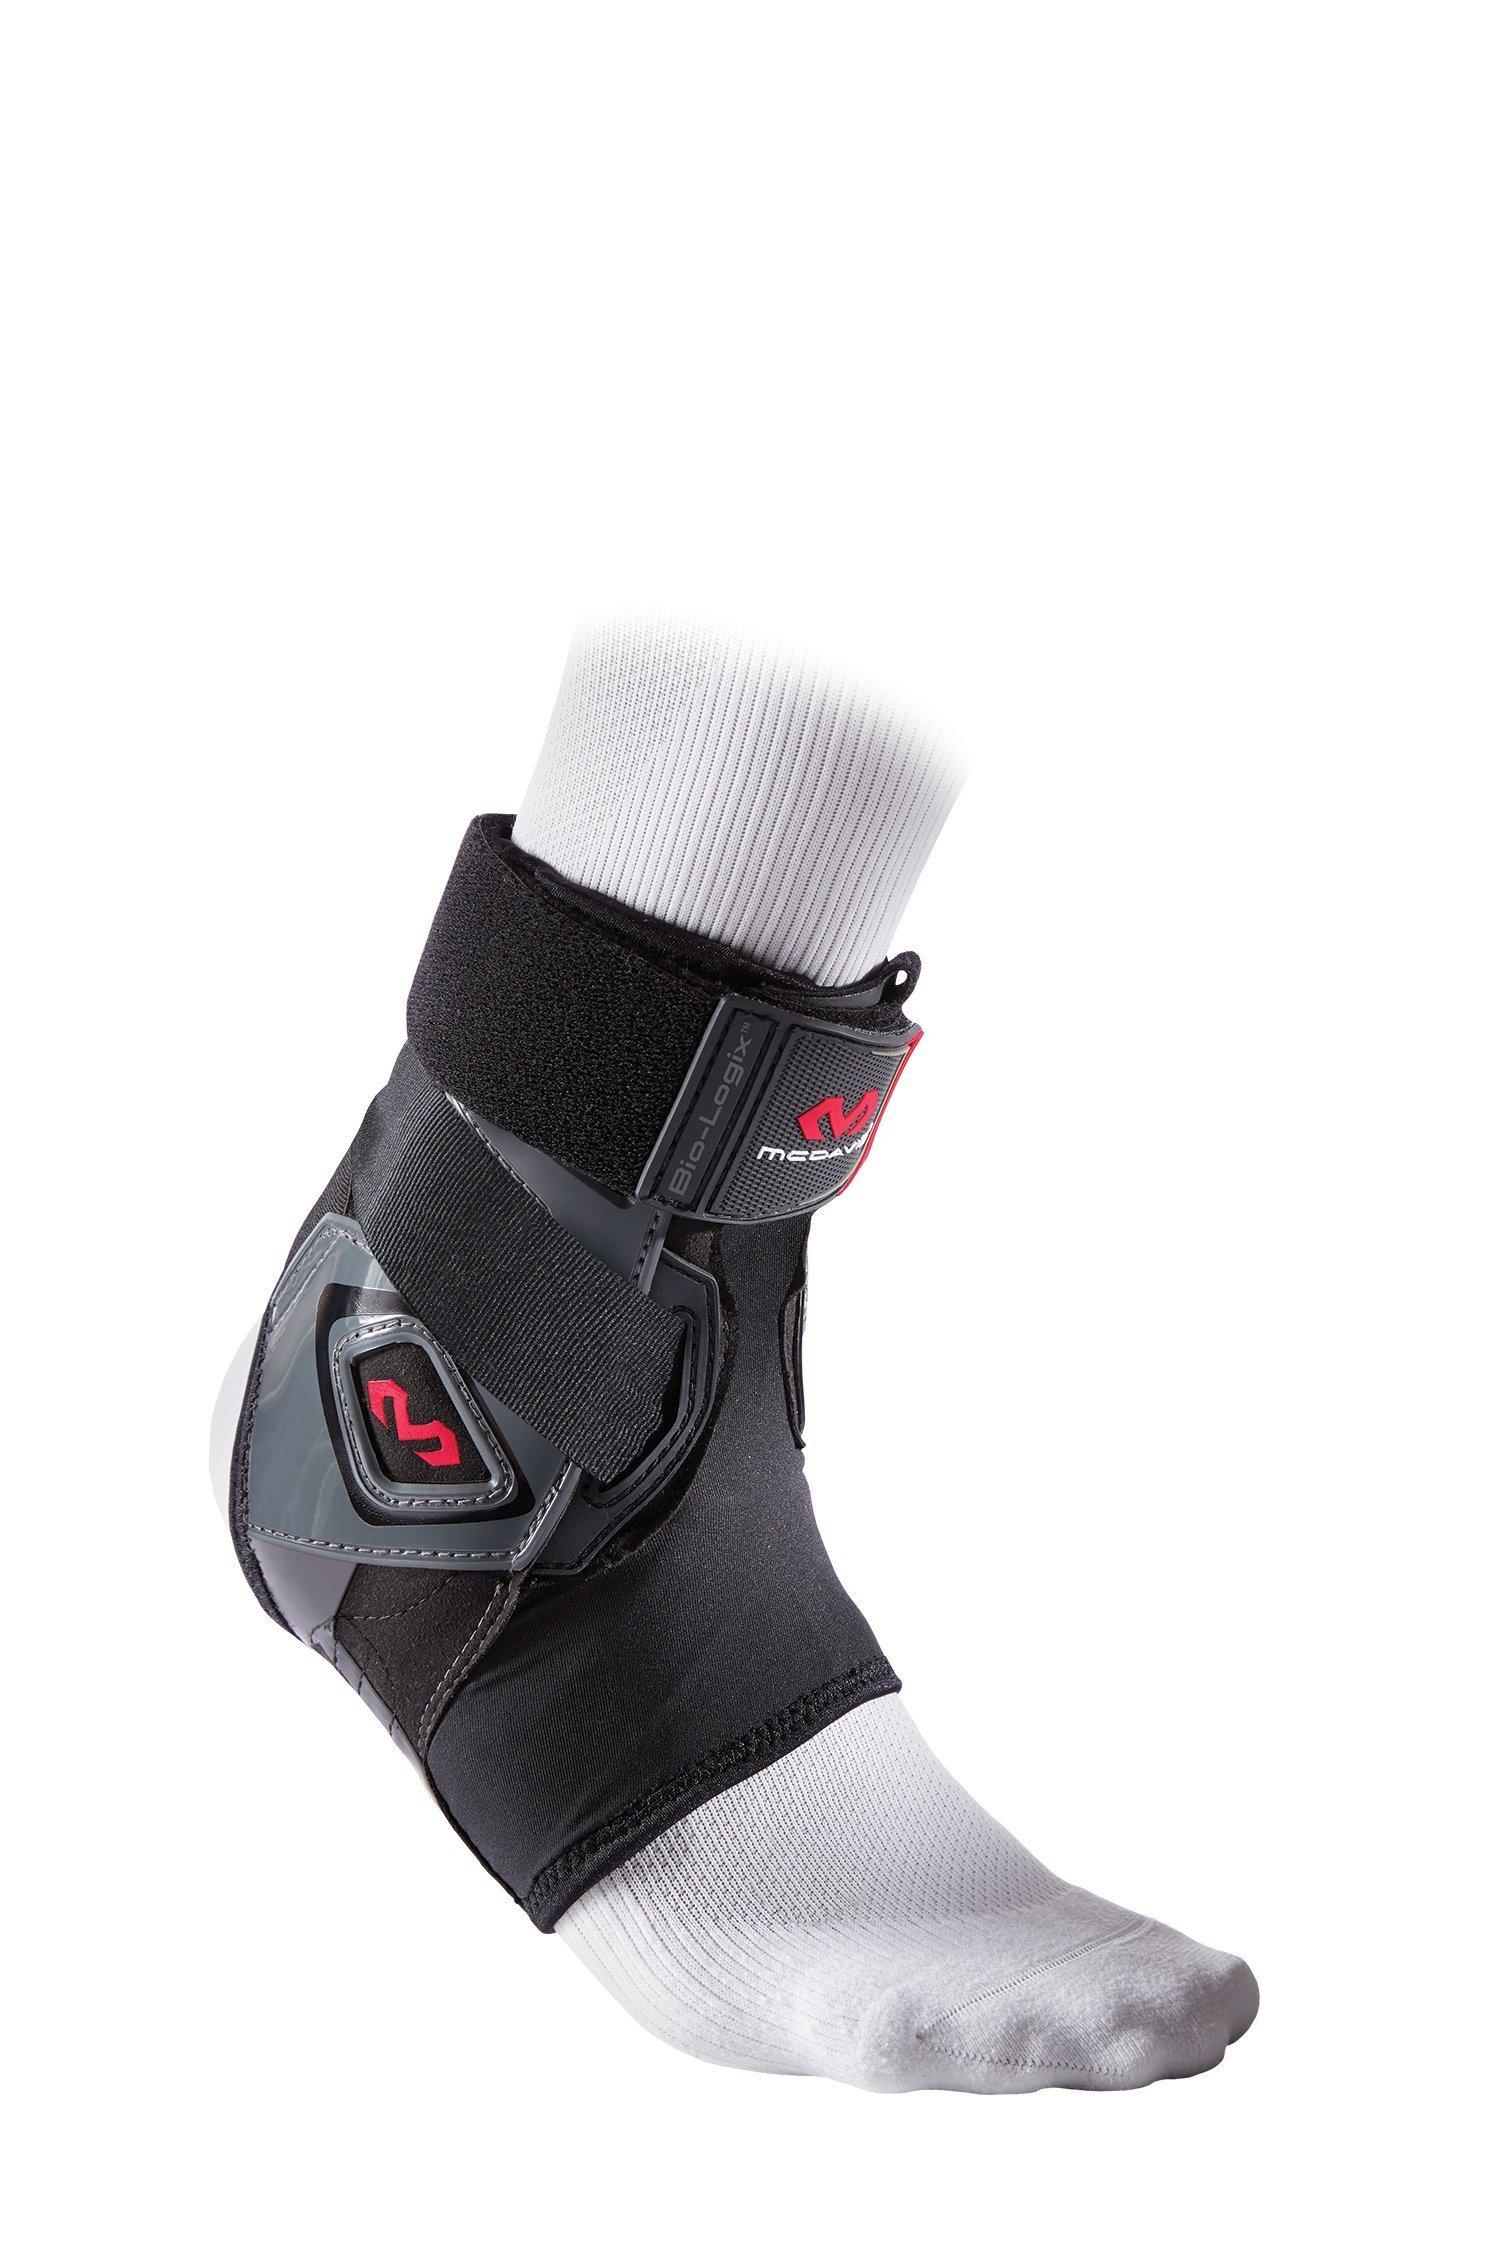 McDavid Bio-Logix Ankle Brace, Black, Medium/Large, Right by McDavid